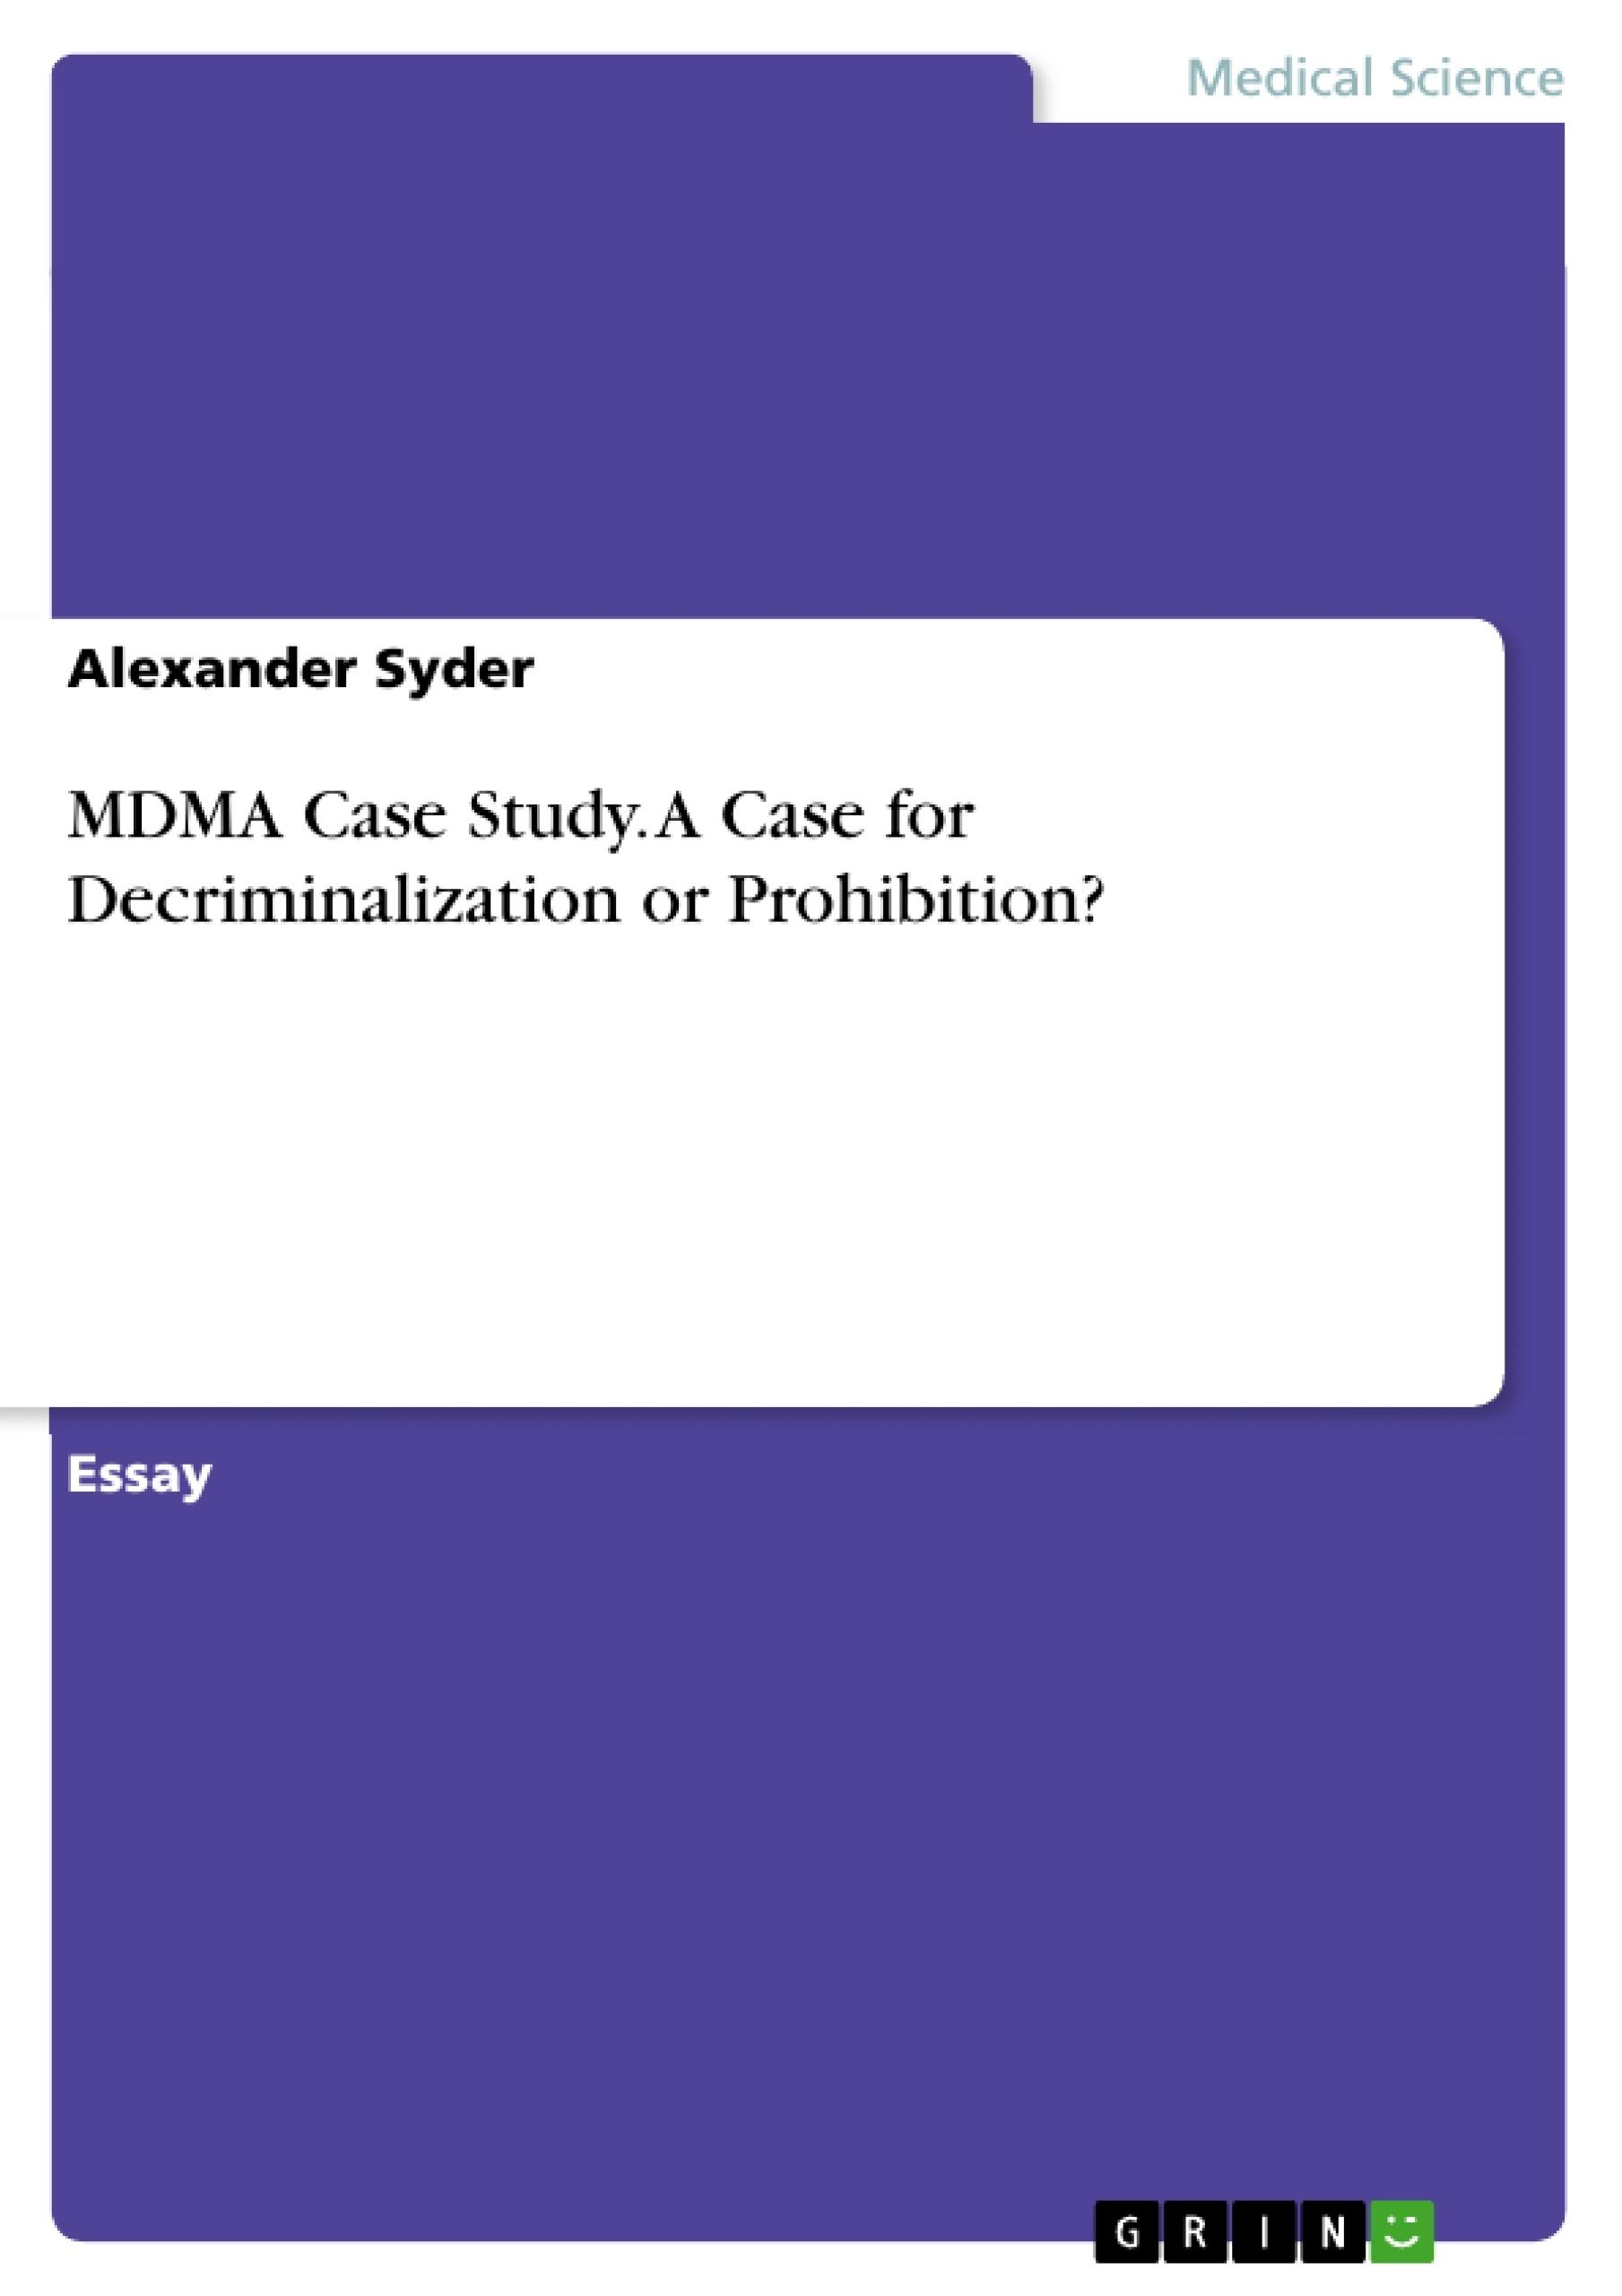 Title: MDMA Case Study. A Case for Decriminalization or Prohibition?